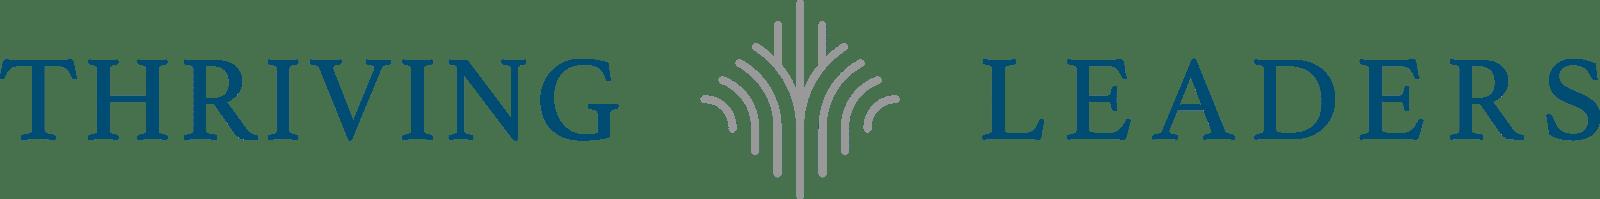 Thriving Leaders Logo